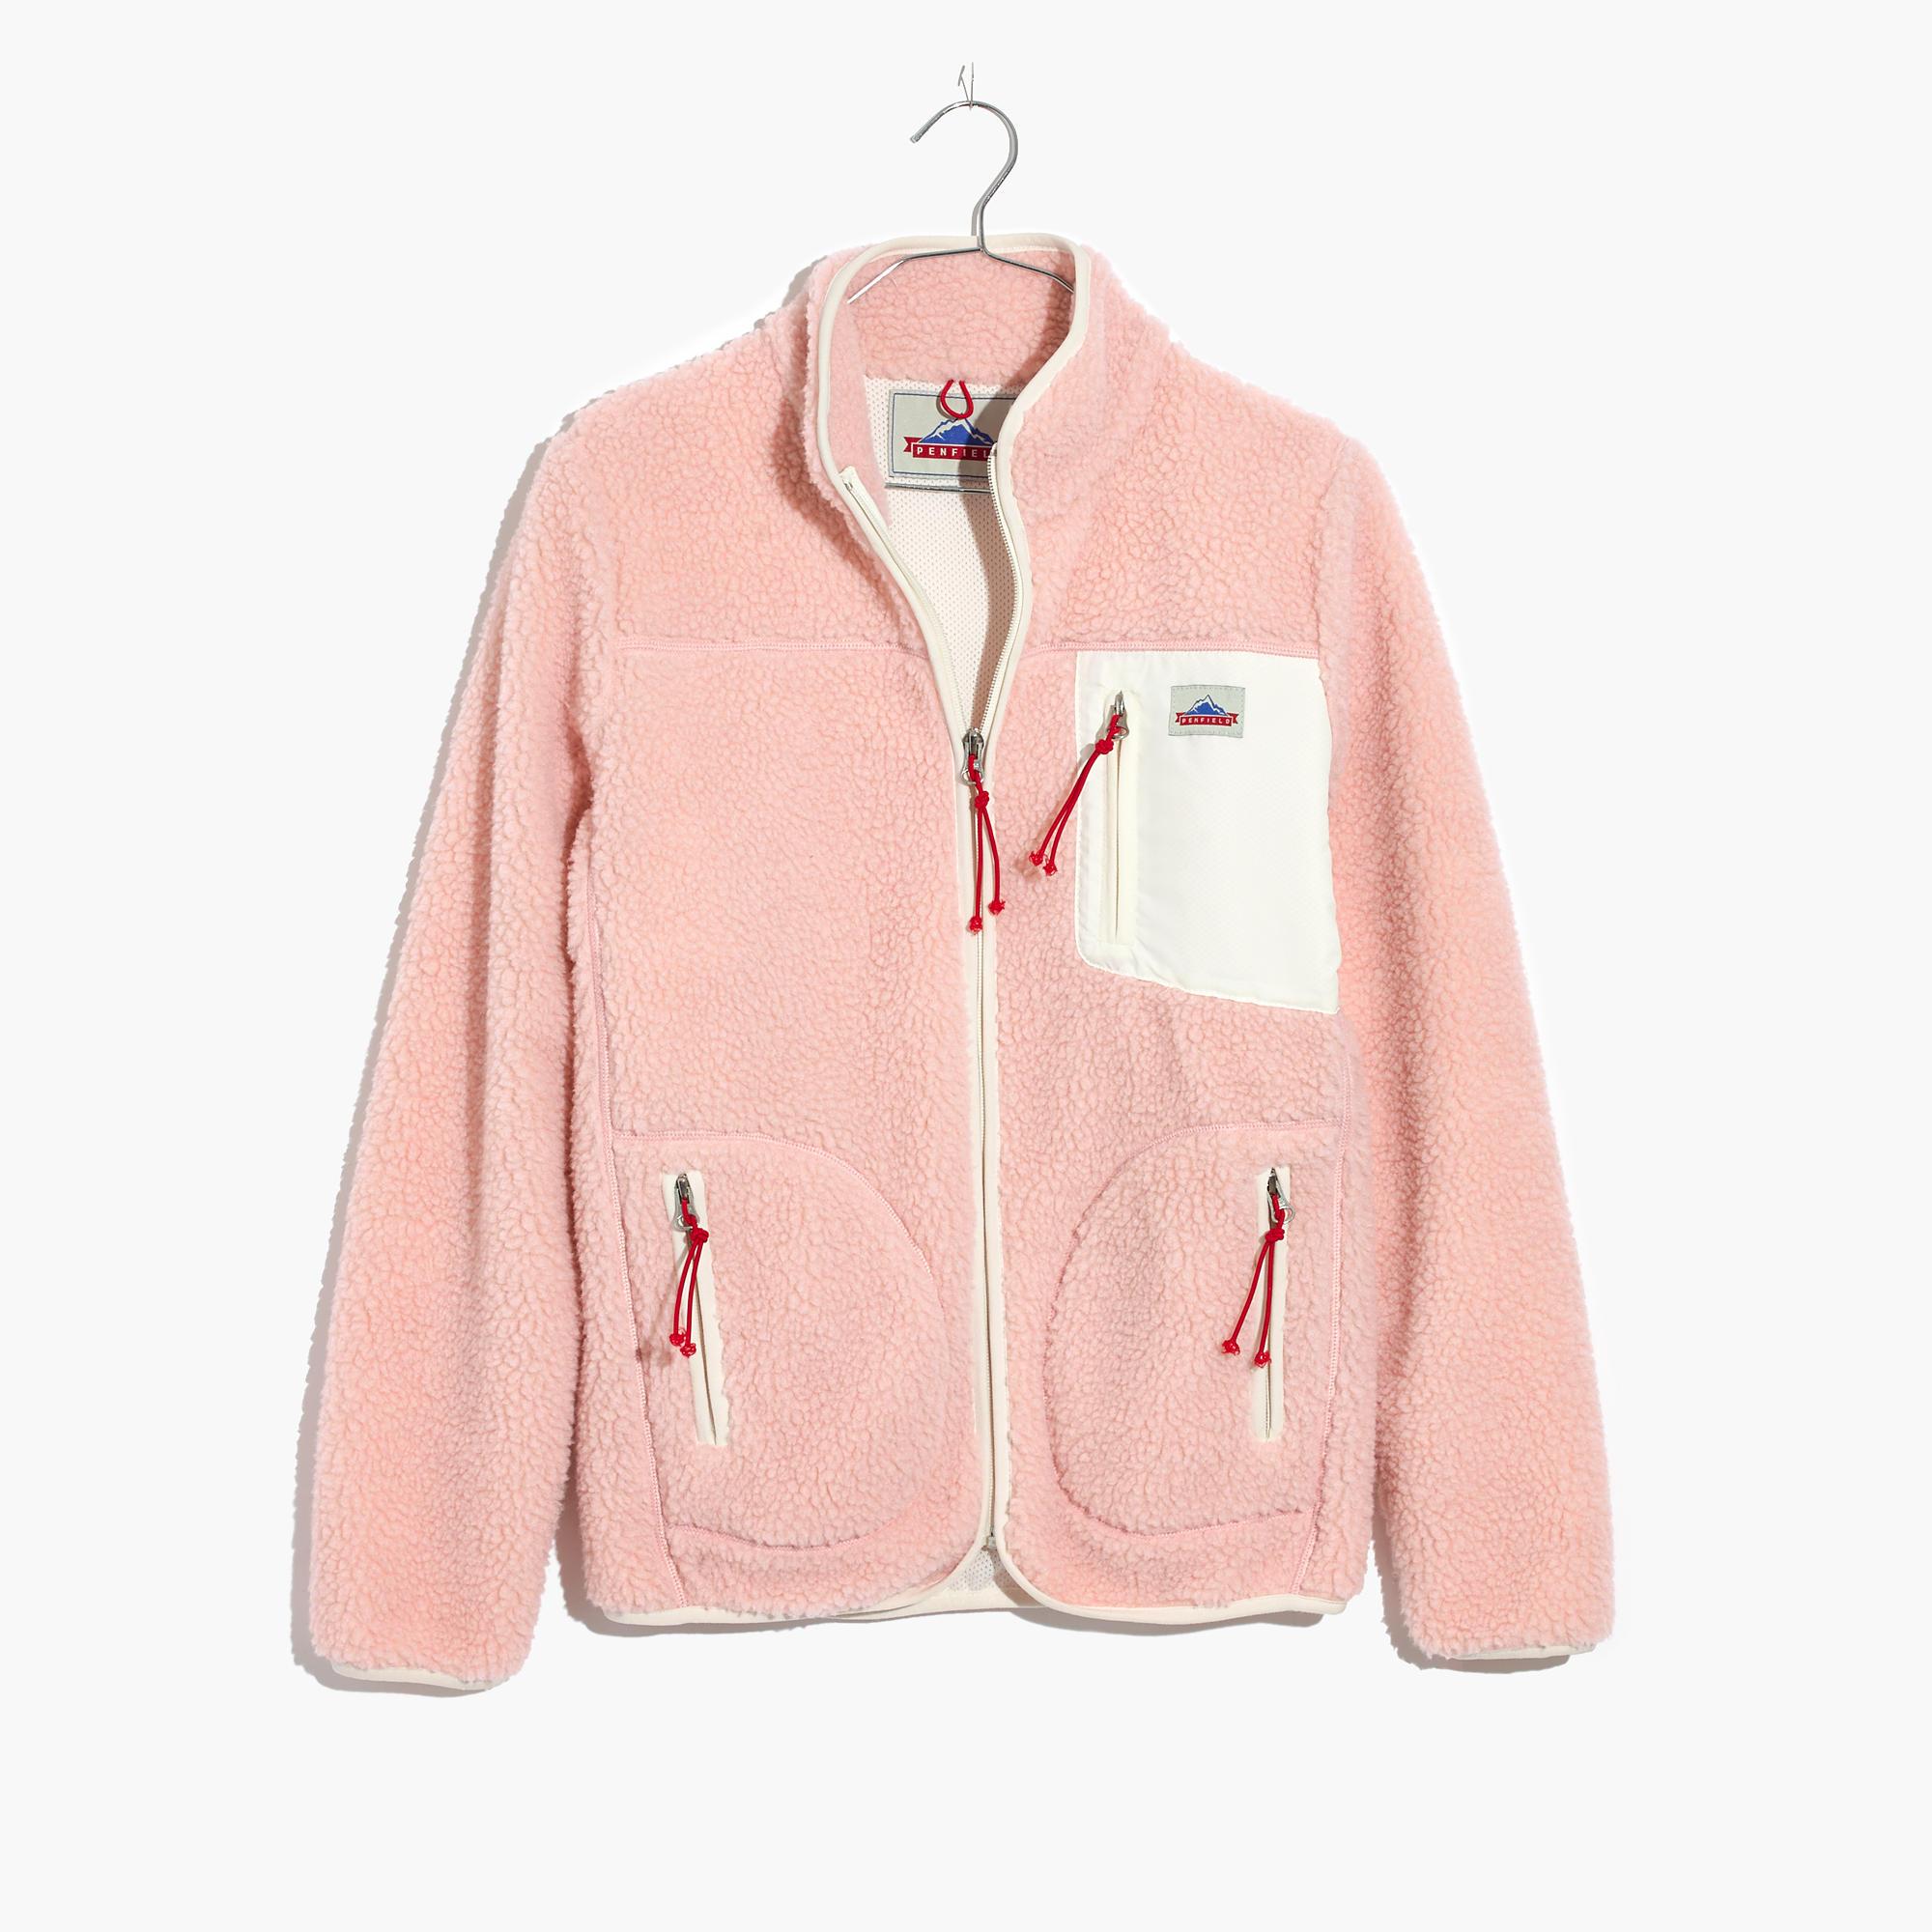 Madewell x Penfield® Lucan Pink Fleece Jacket : shopmadewell ...